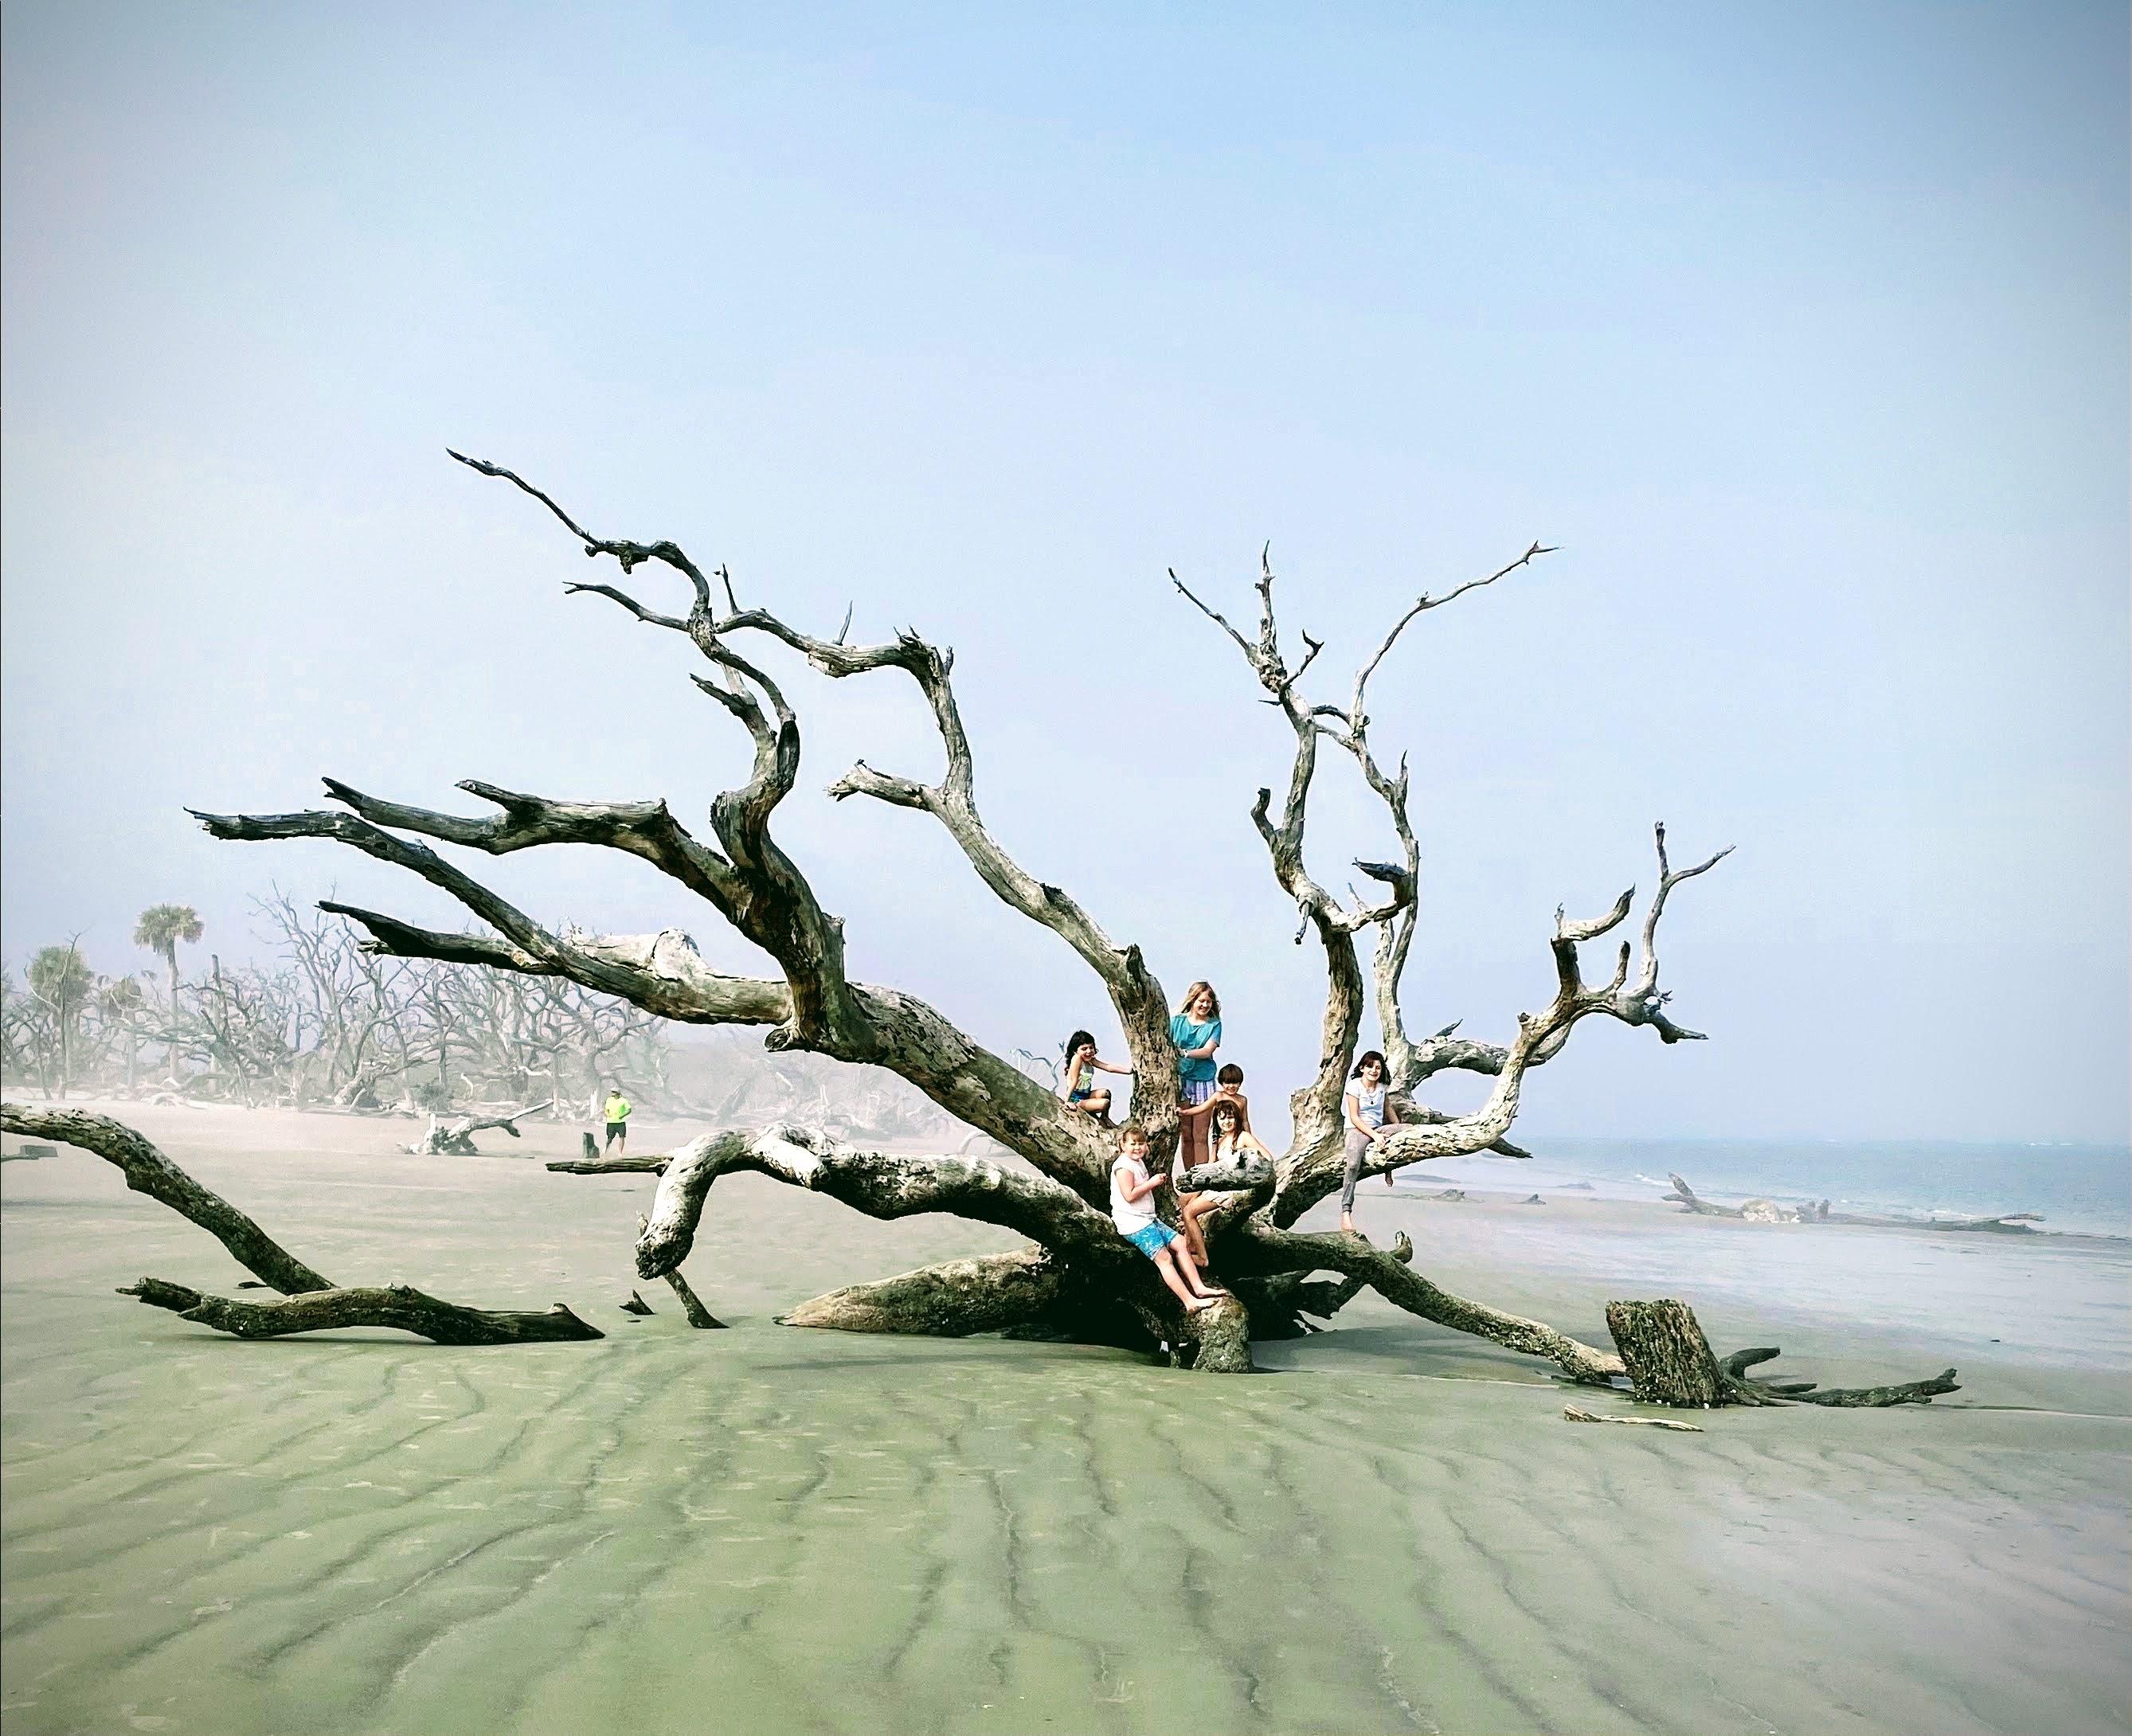 Idriftwood beach